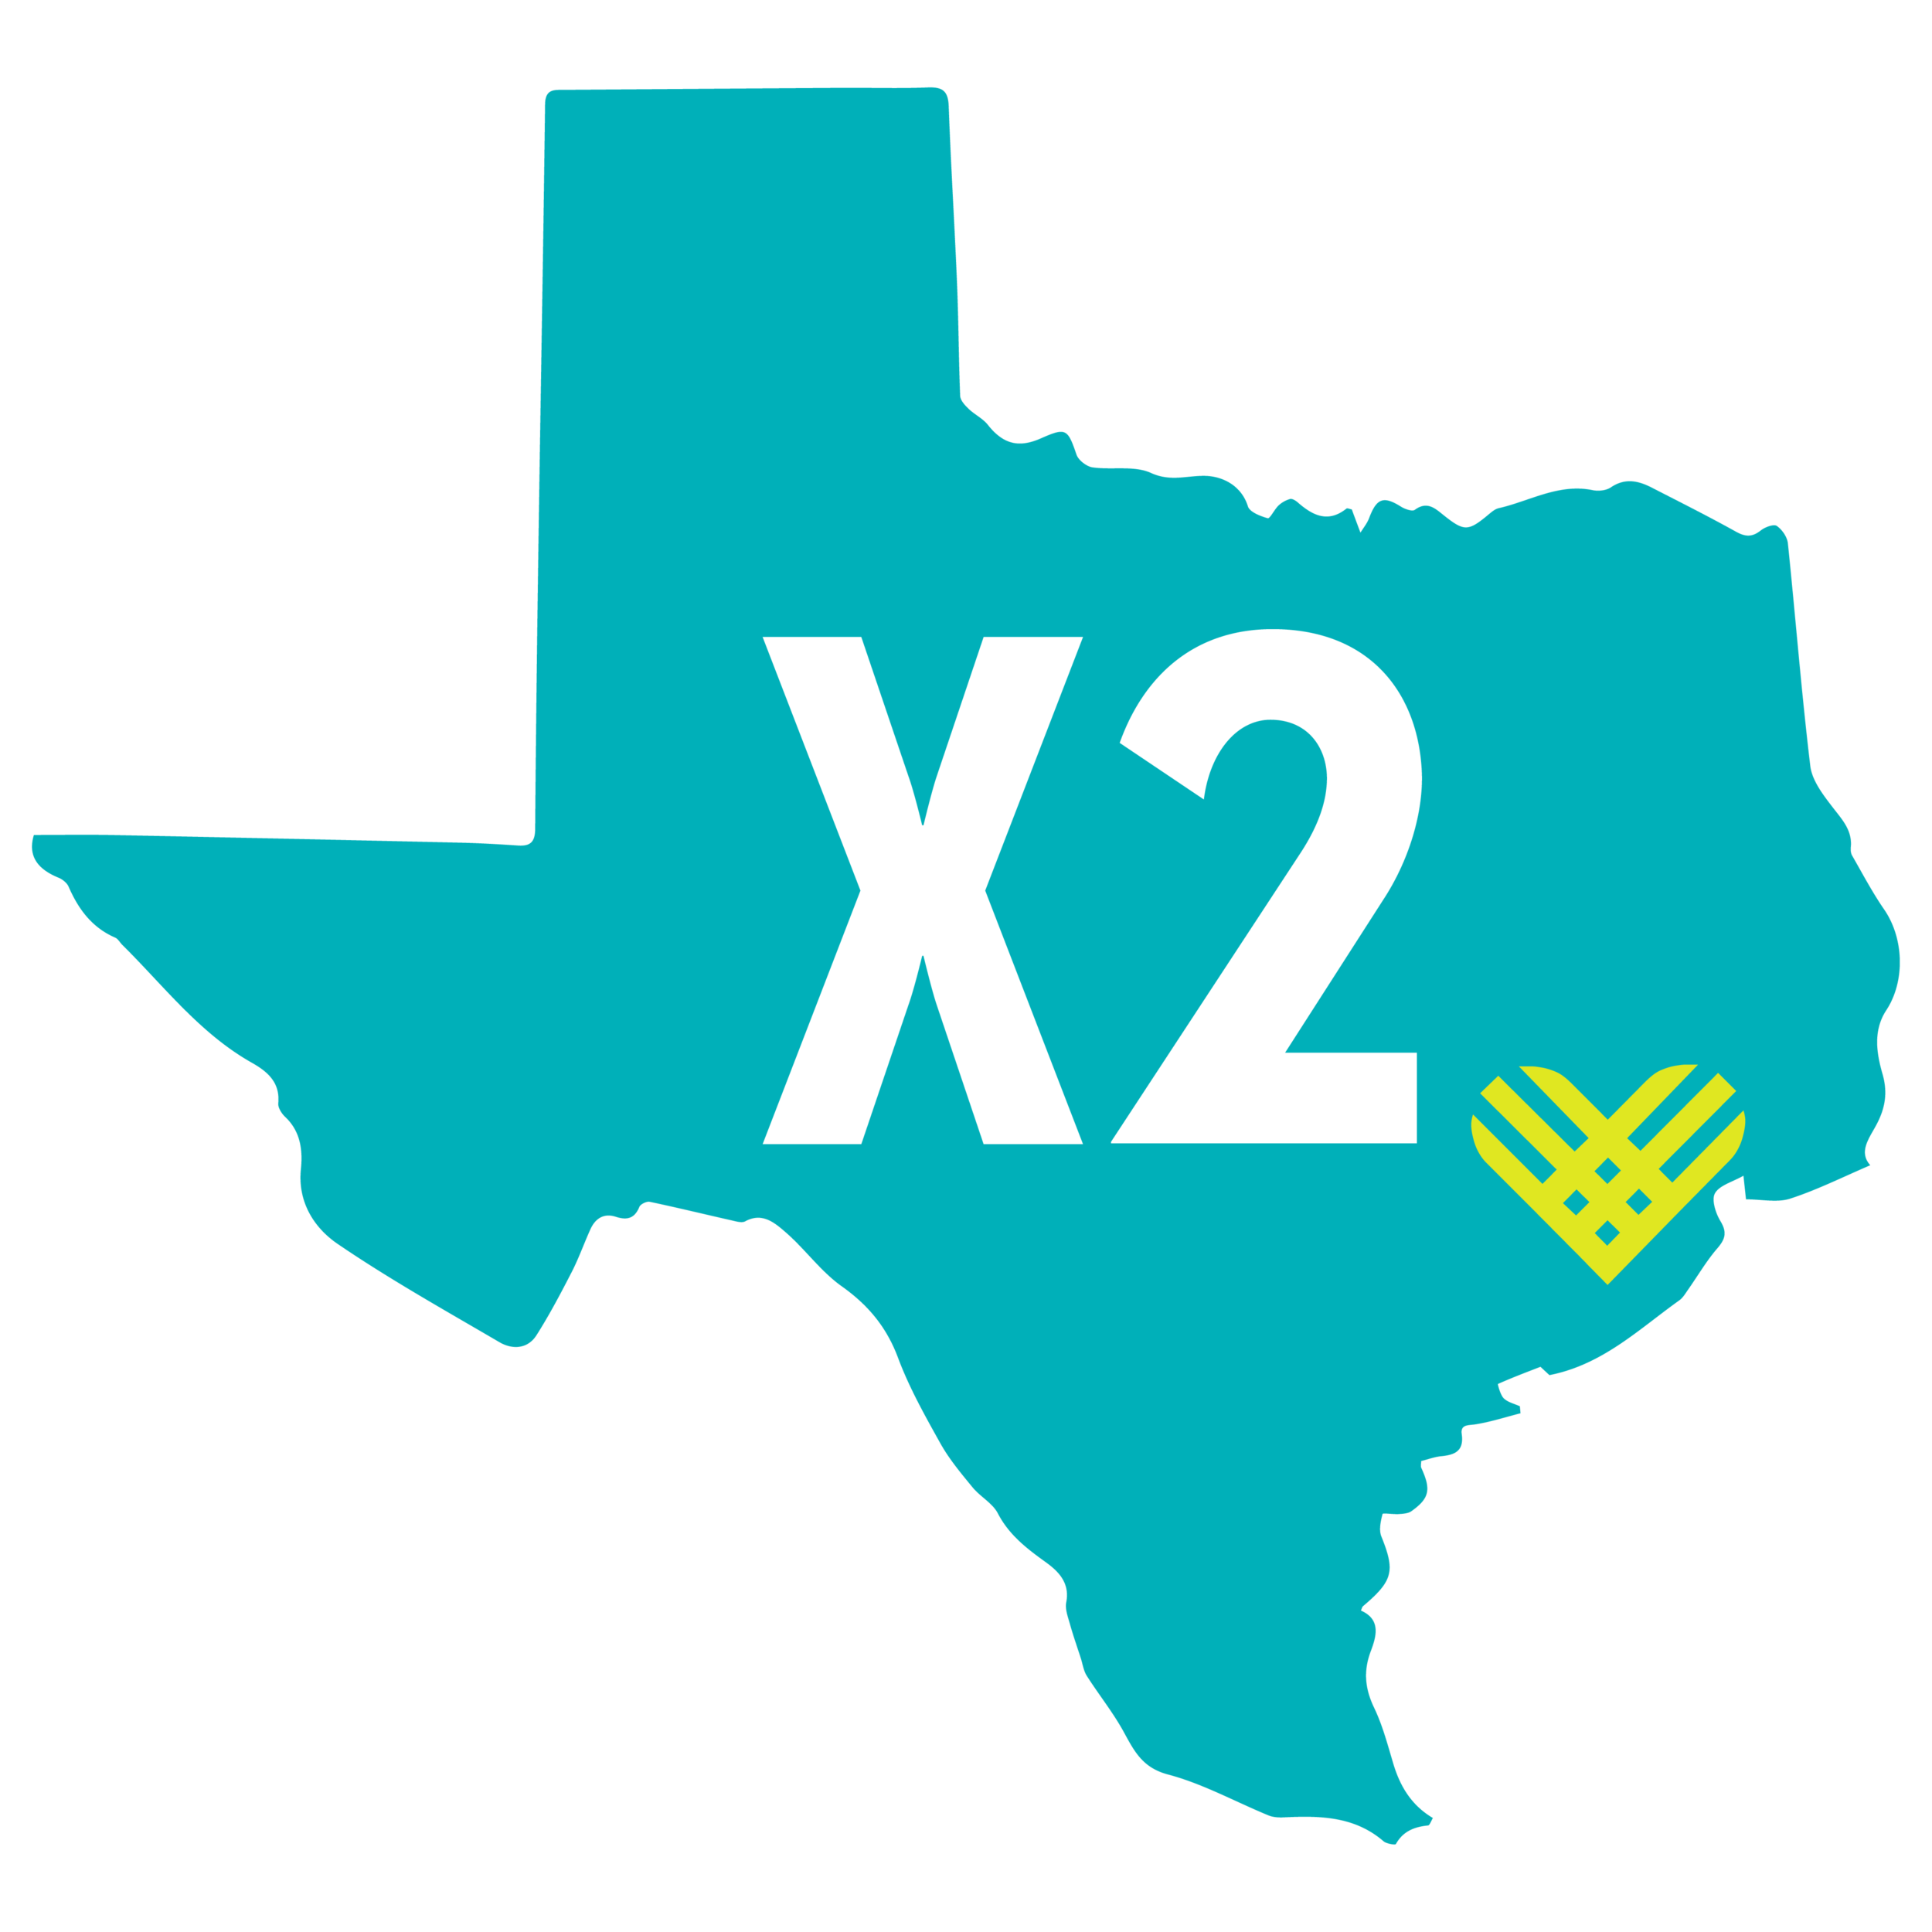 TexasHeartX2-02-01.png